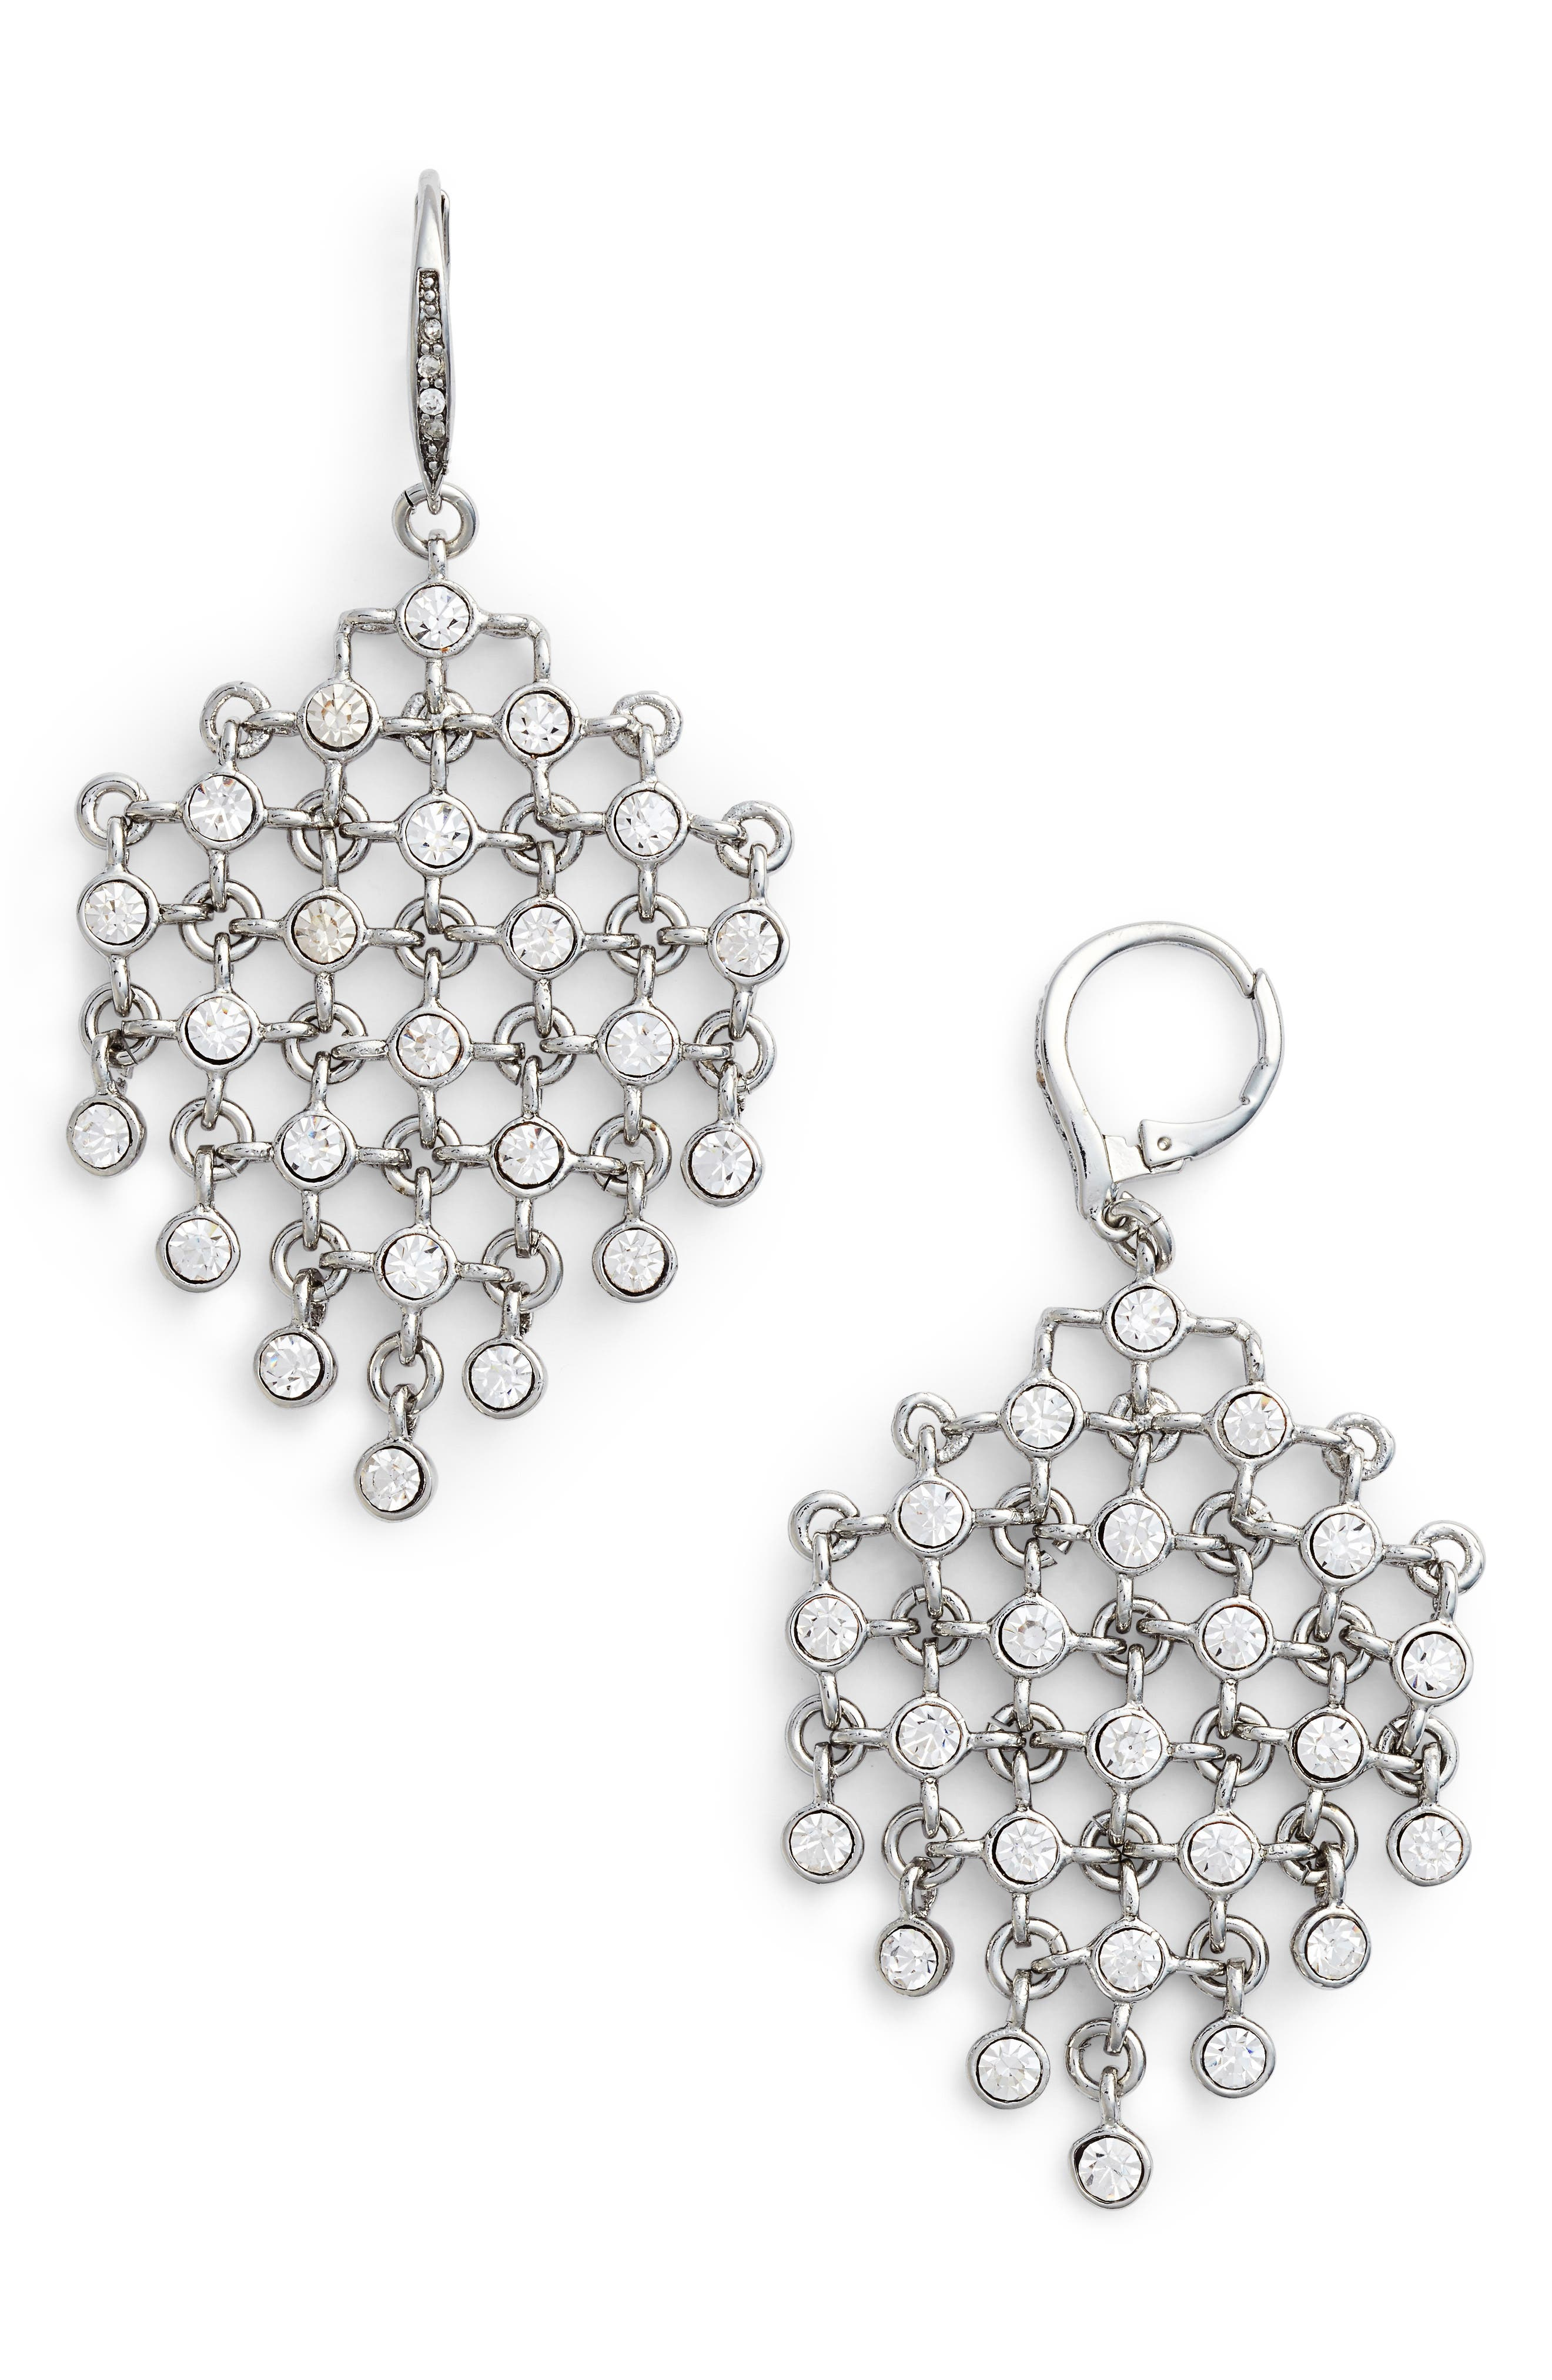 Kite Earrings,                             Main thumbnail 1, color,                             Crystal/ Silver